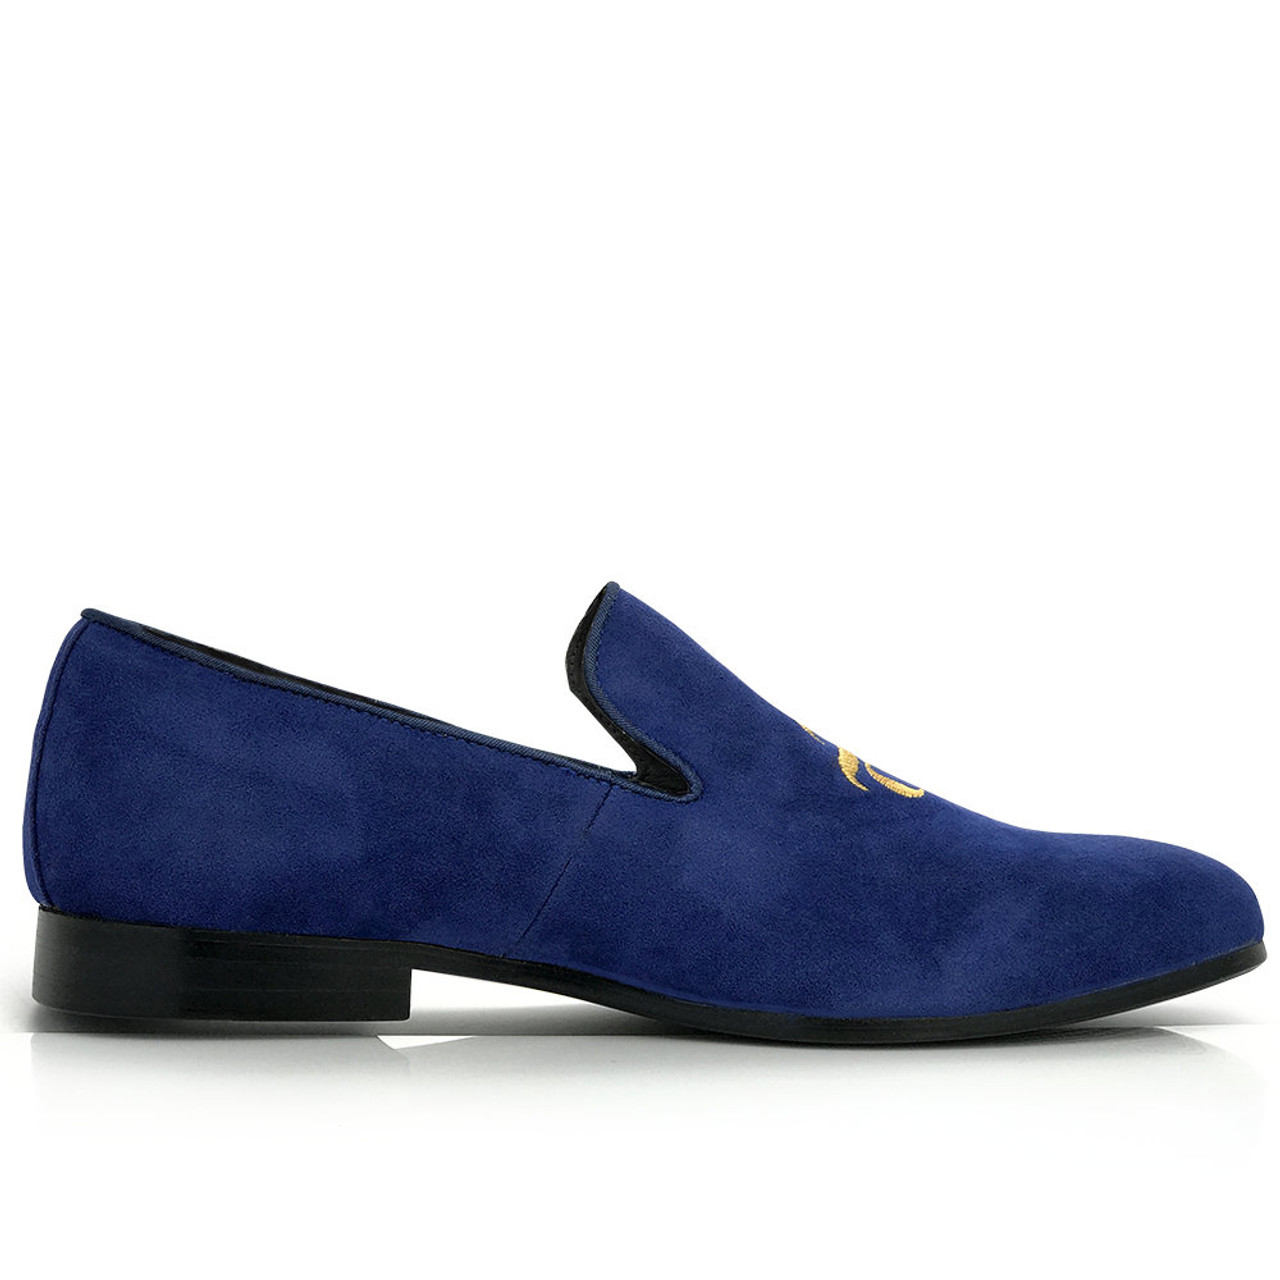 c42c55e0481 Royalty - Suede Burju Logo Loafer - Burju Shoes